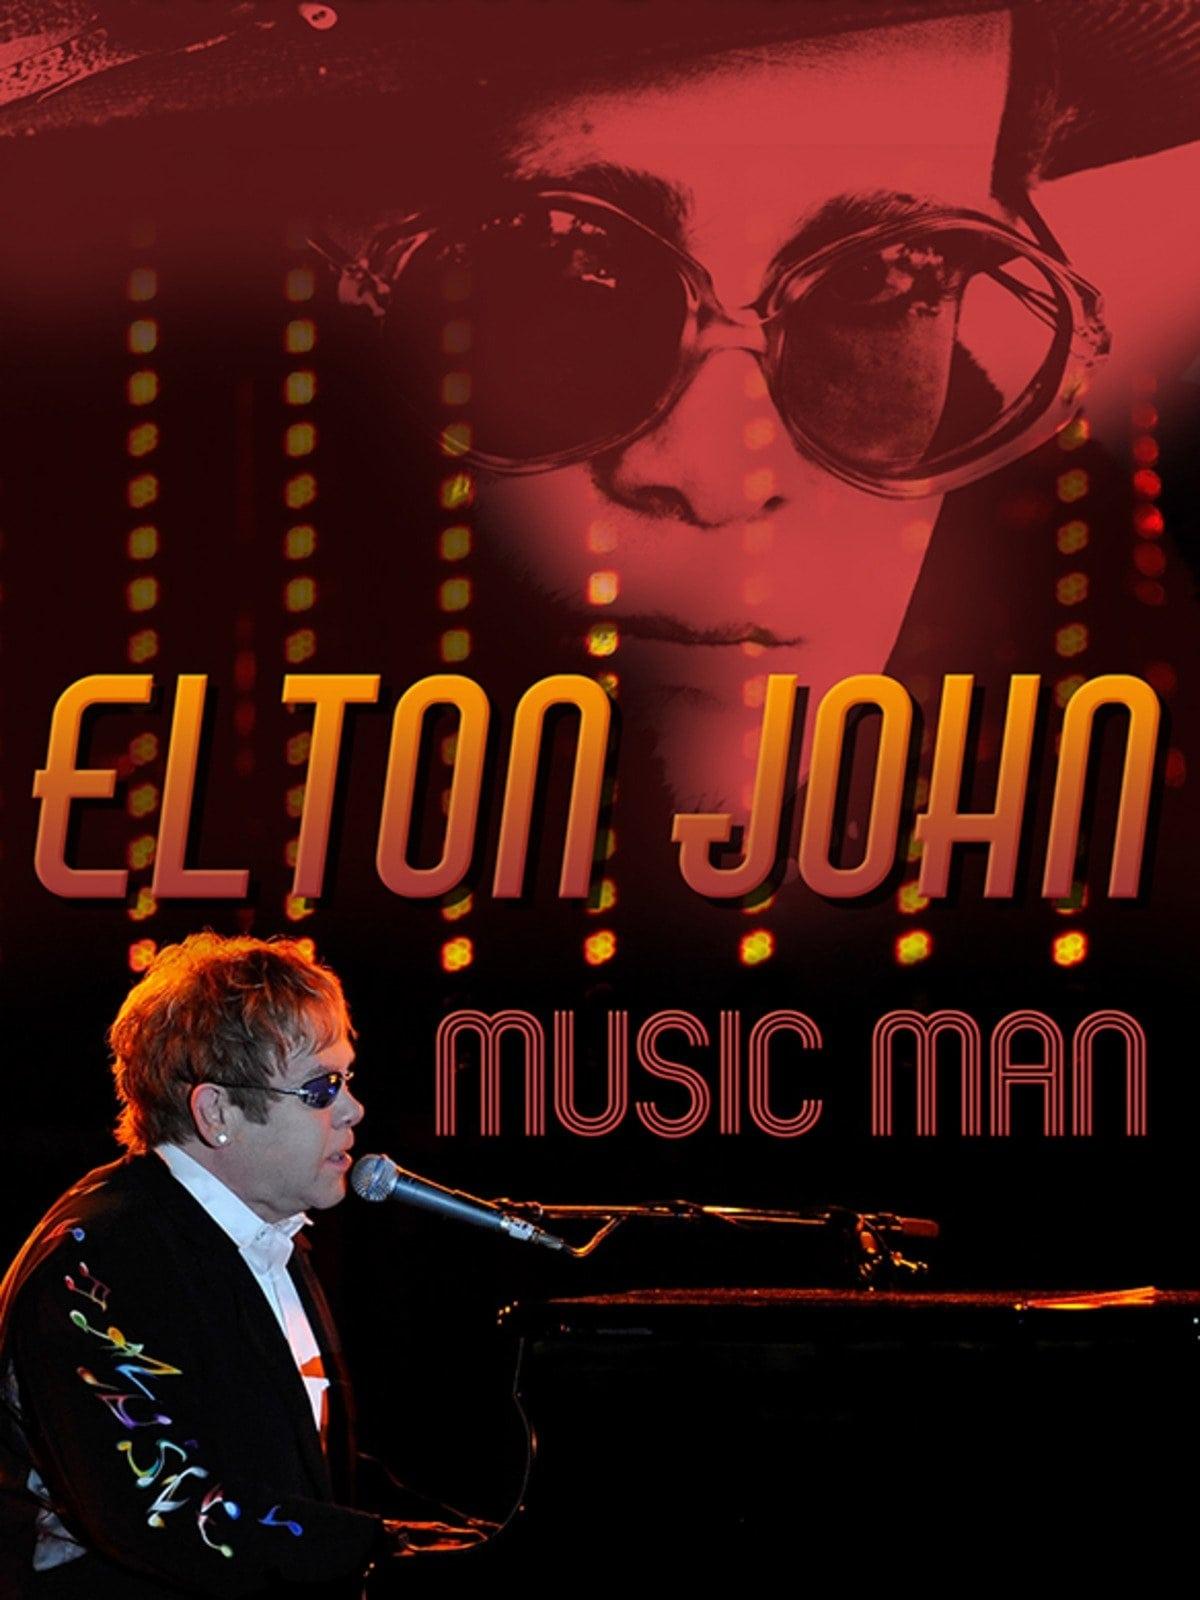 Elton John: Music Man on FREECABLE TV